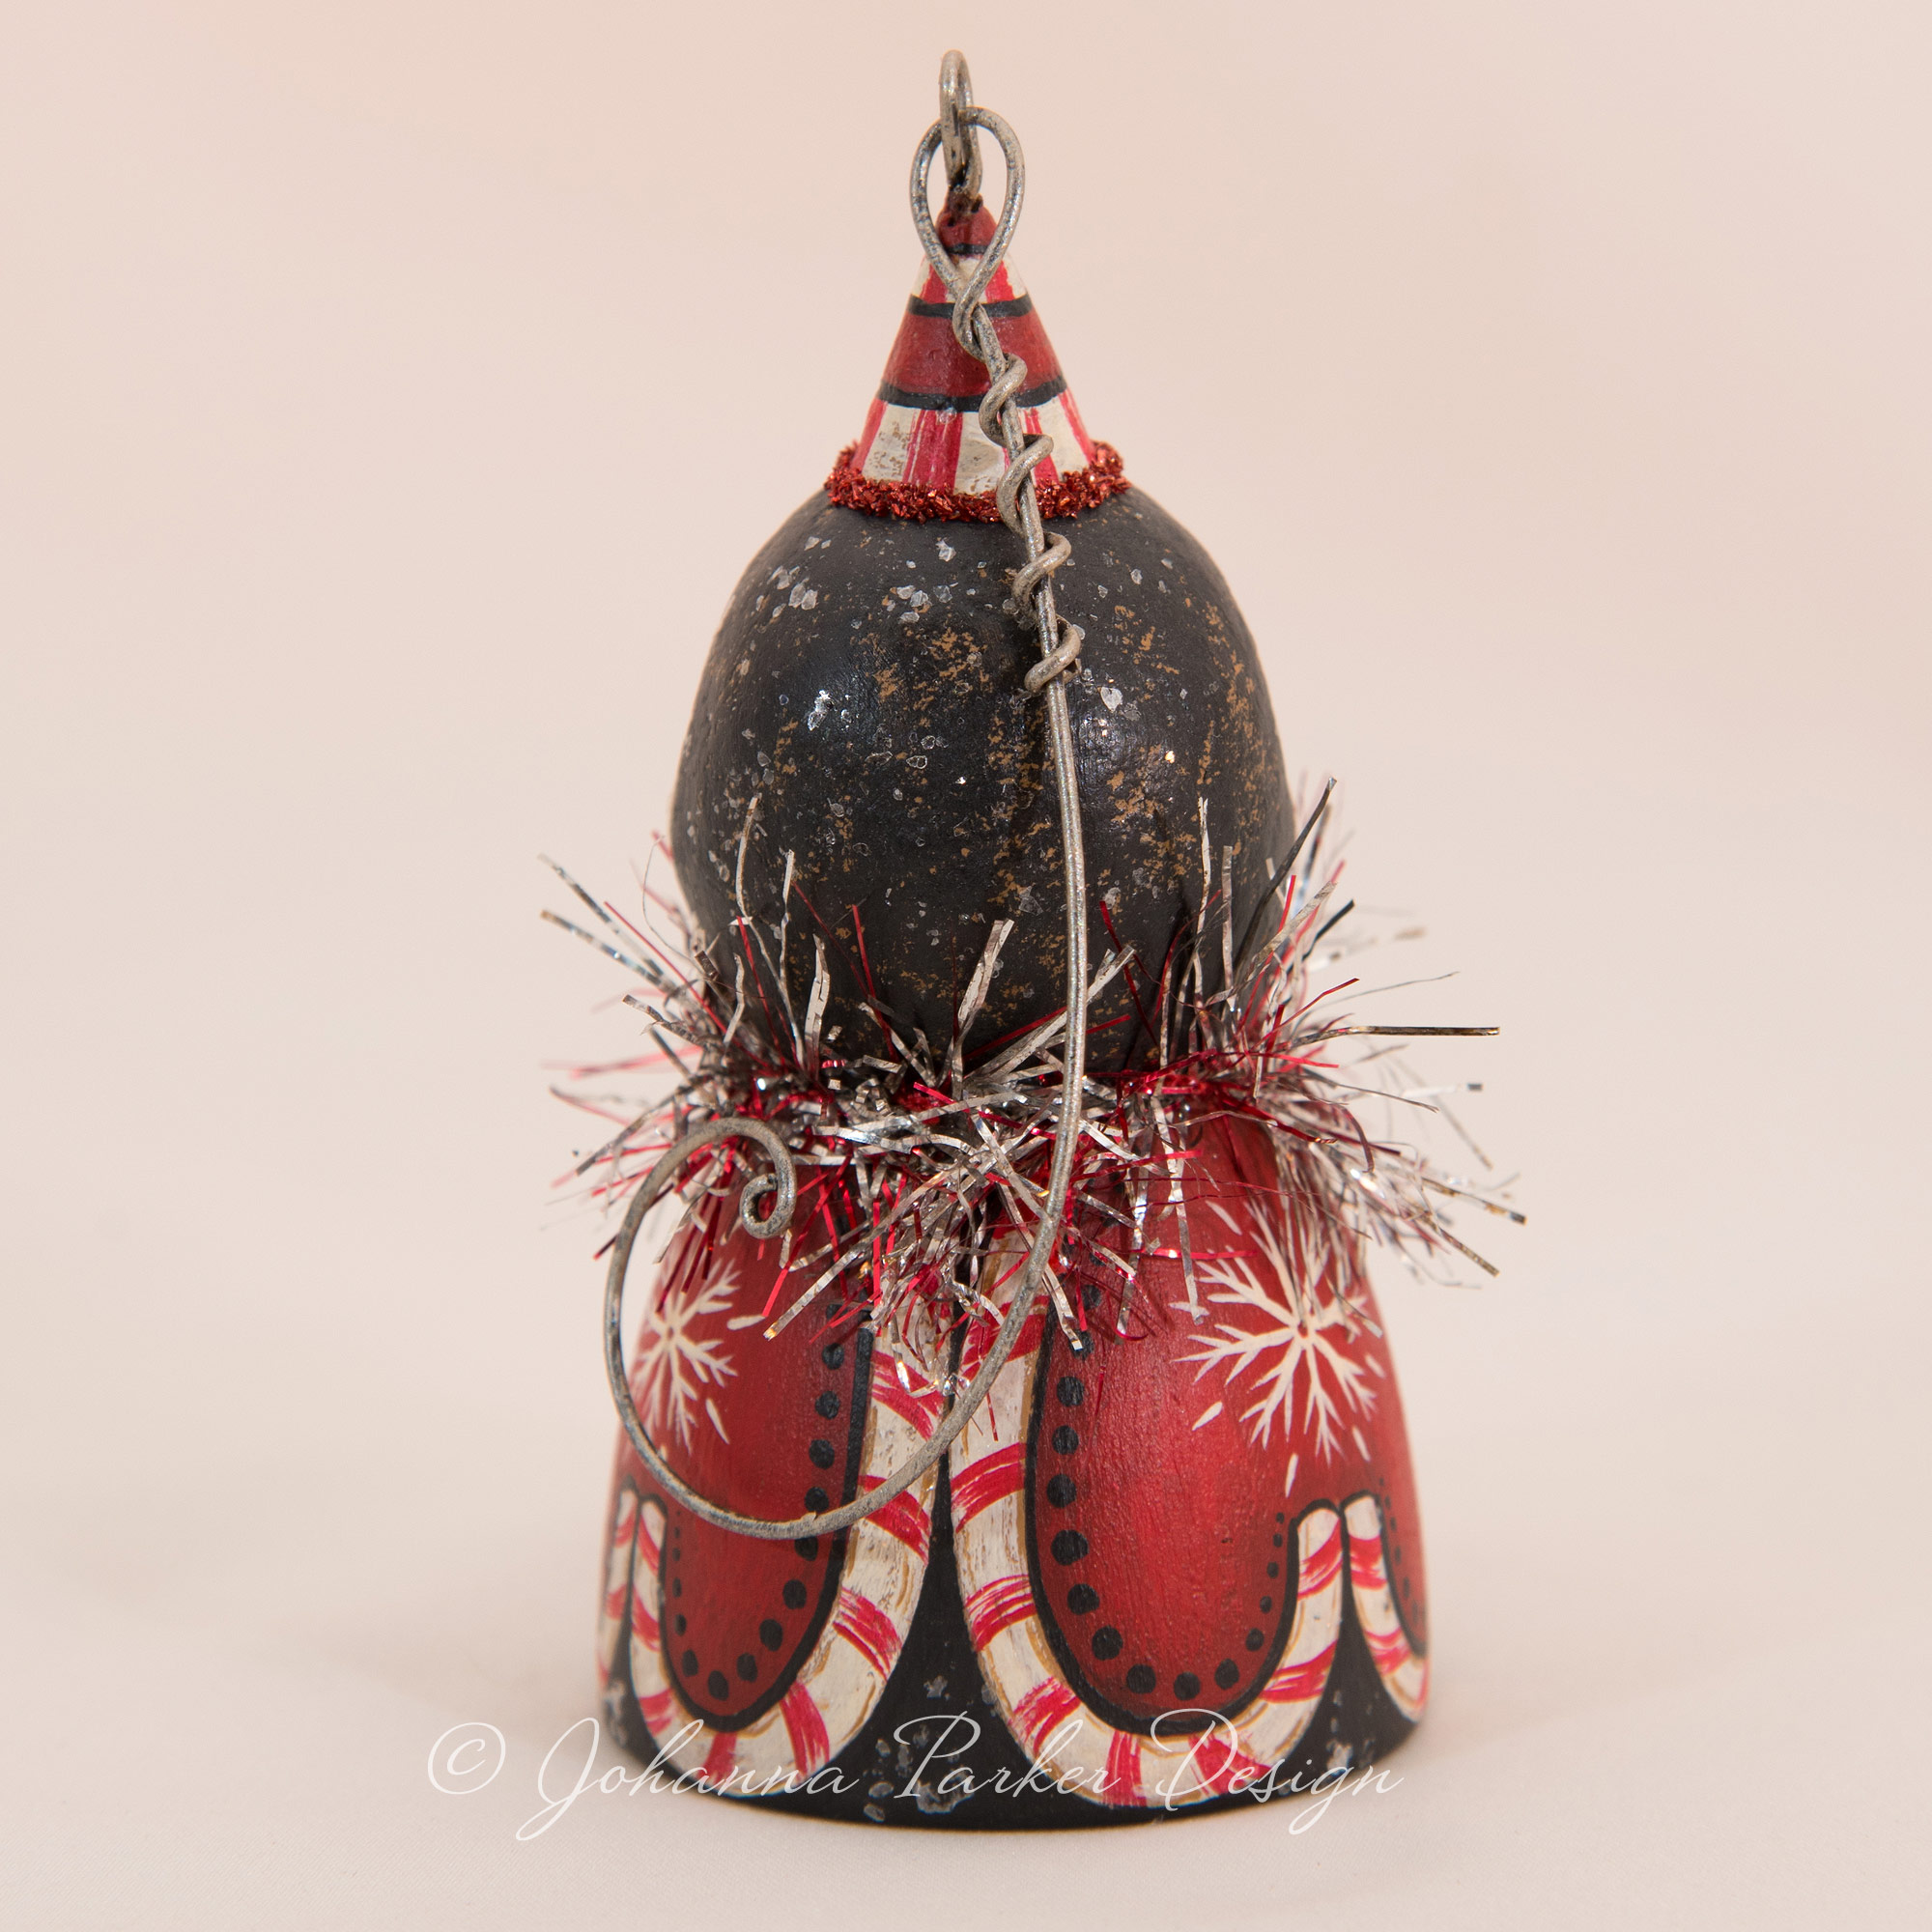 Johanna-Parker-Penguin-Ornament-Bell-3.jpg